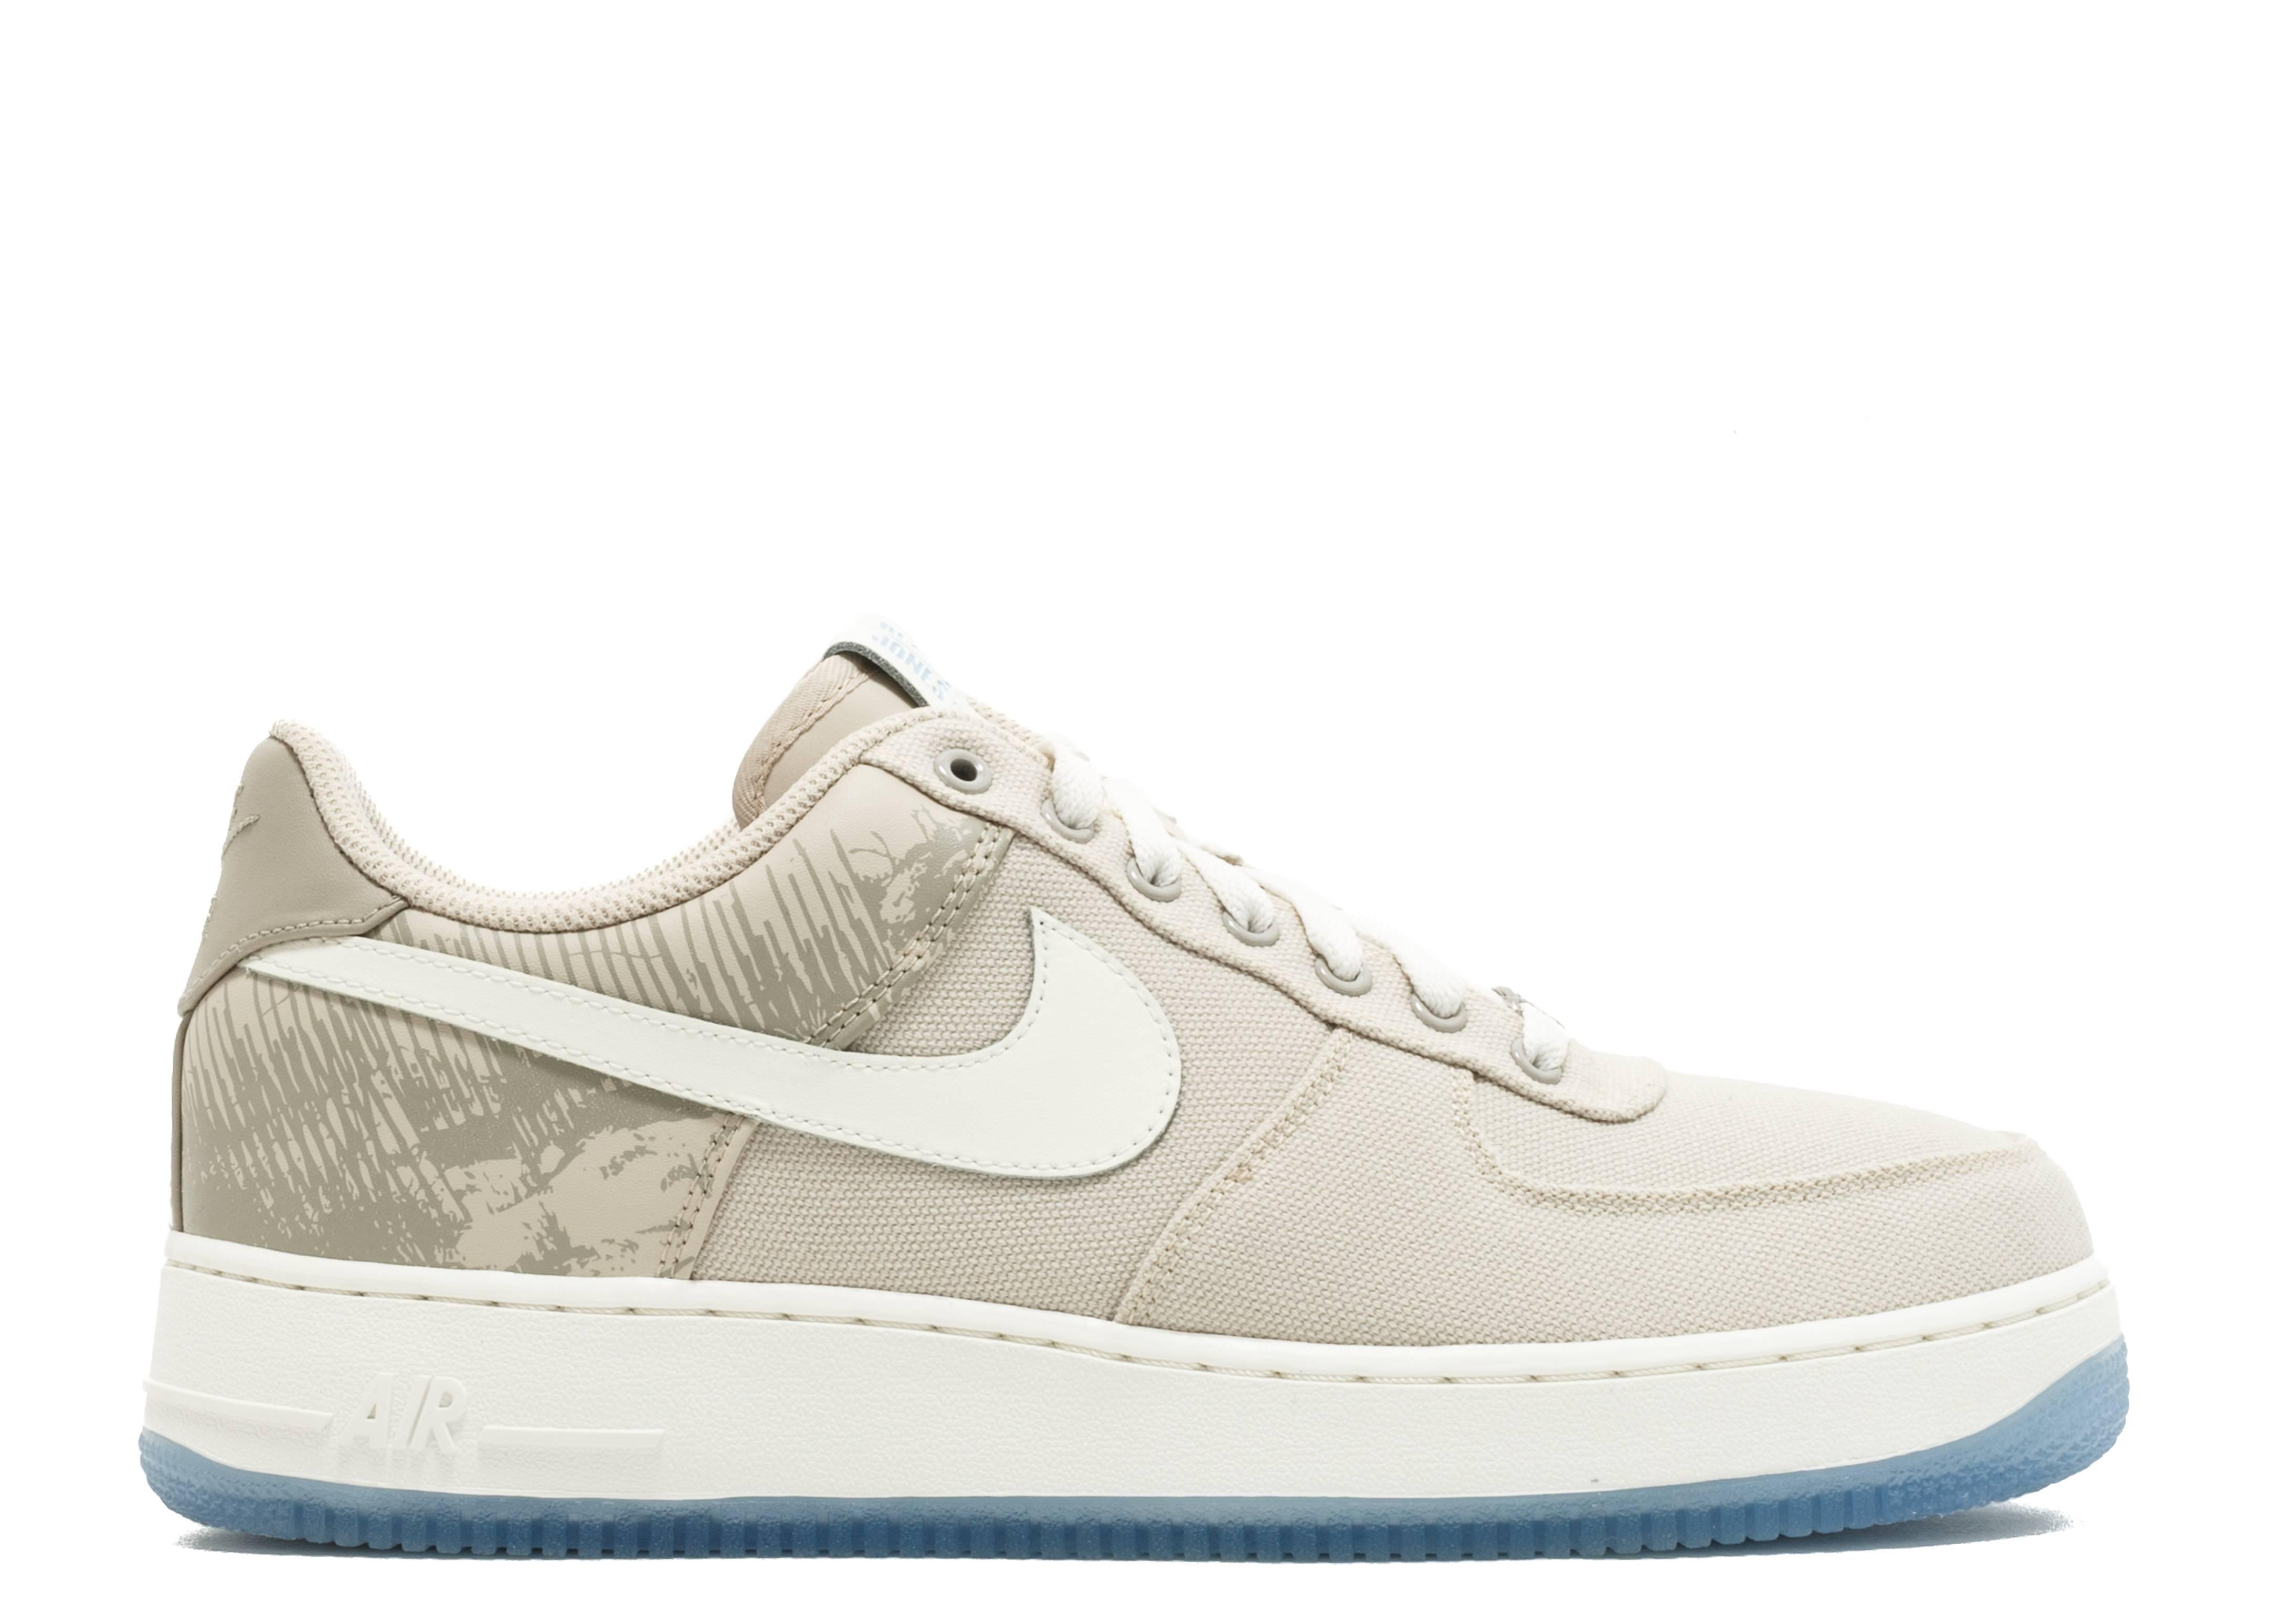 low priced 5102b d3b08 nike. Nike Air Force 1 Low ...